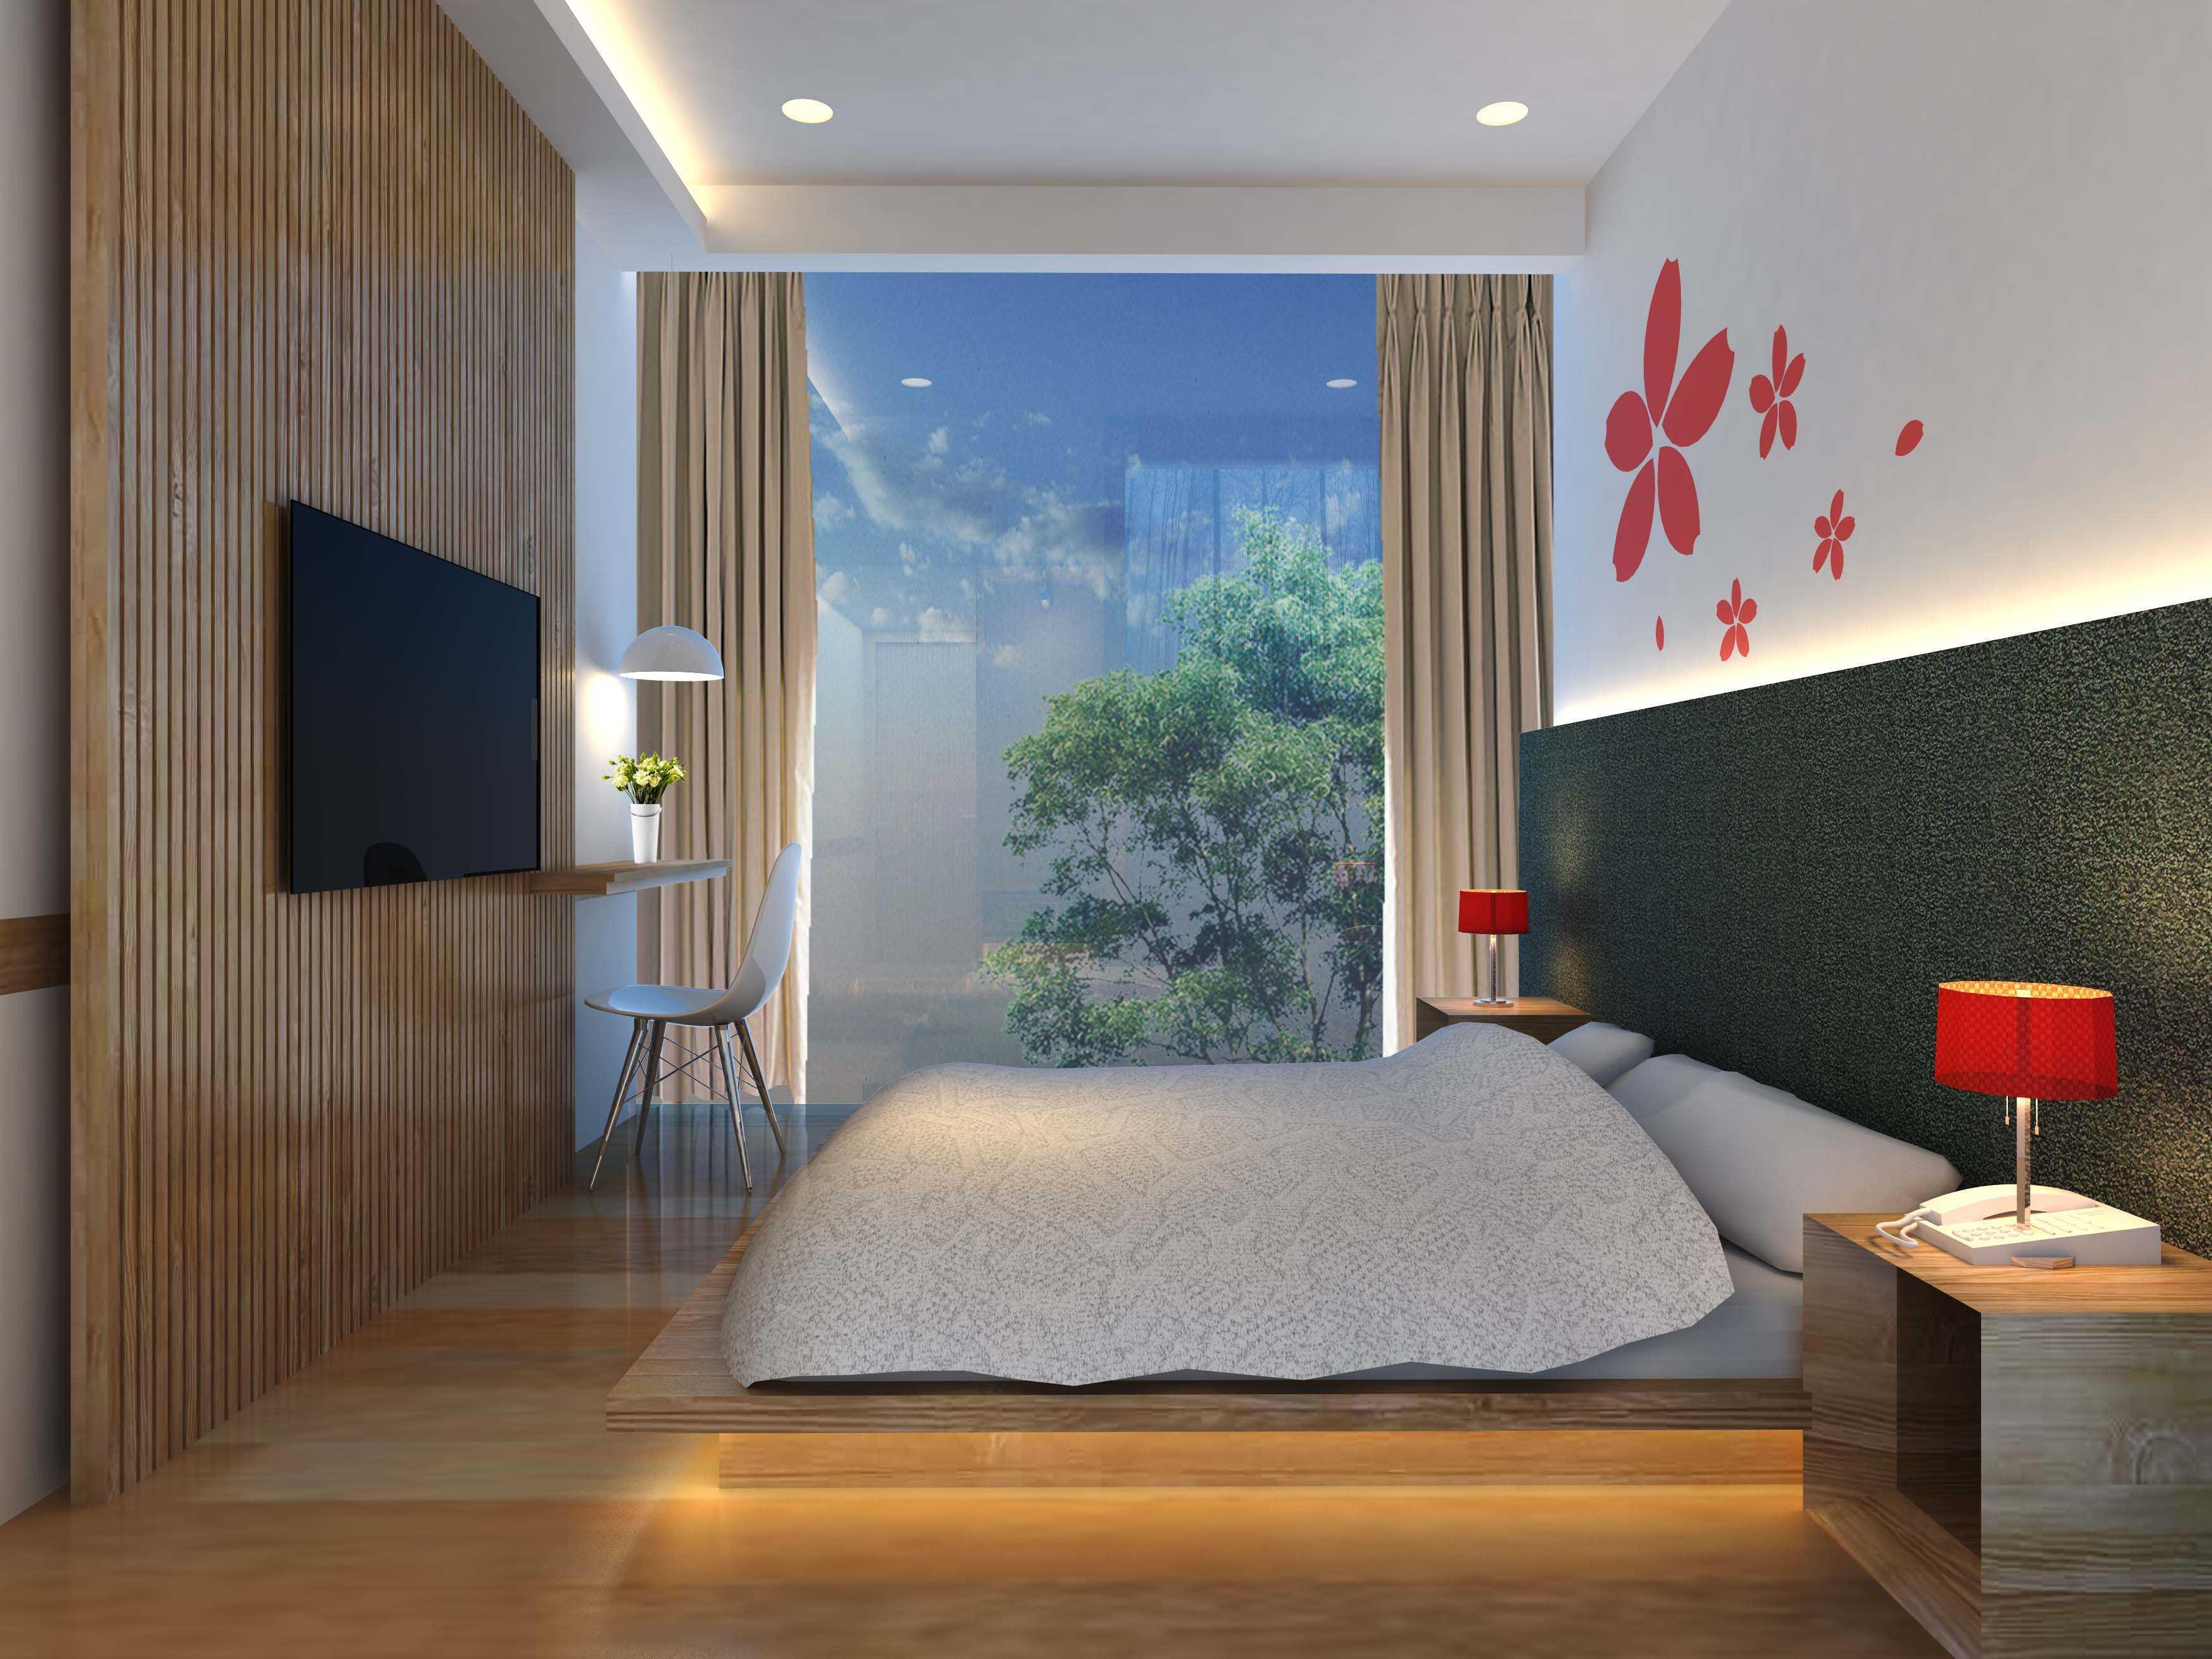 Erik Esdras Tokyo Hotel Jakarta Jakarta Hotel Room Minimalis,asian  24981